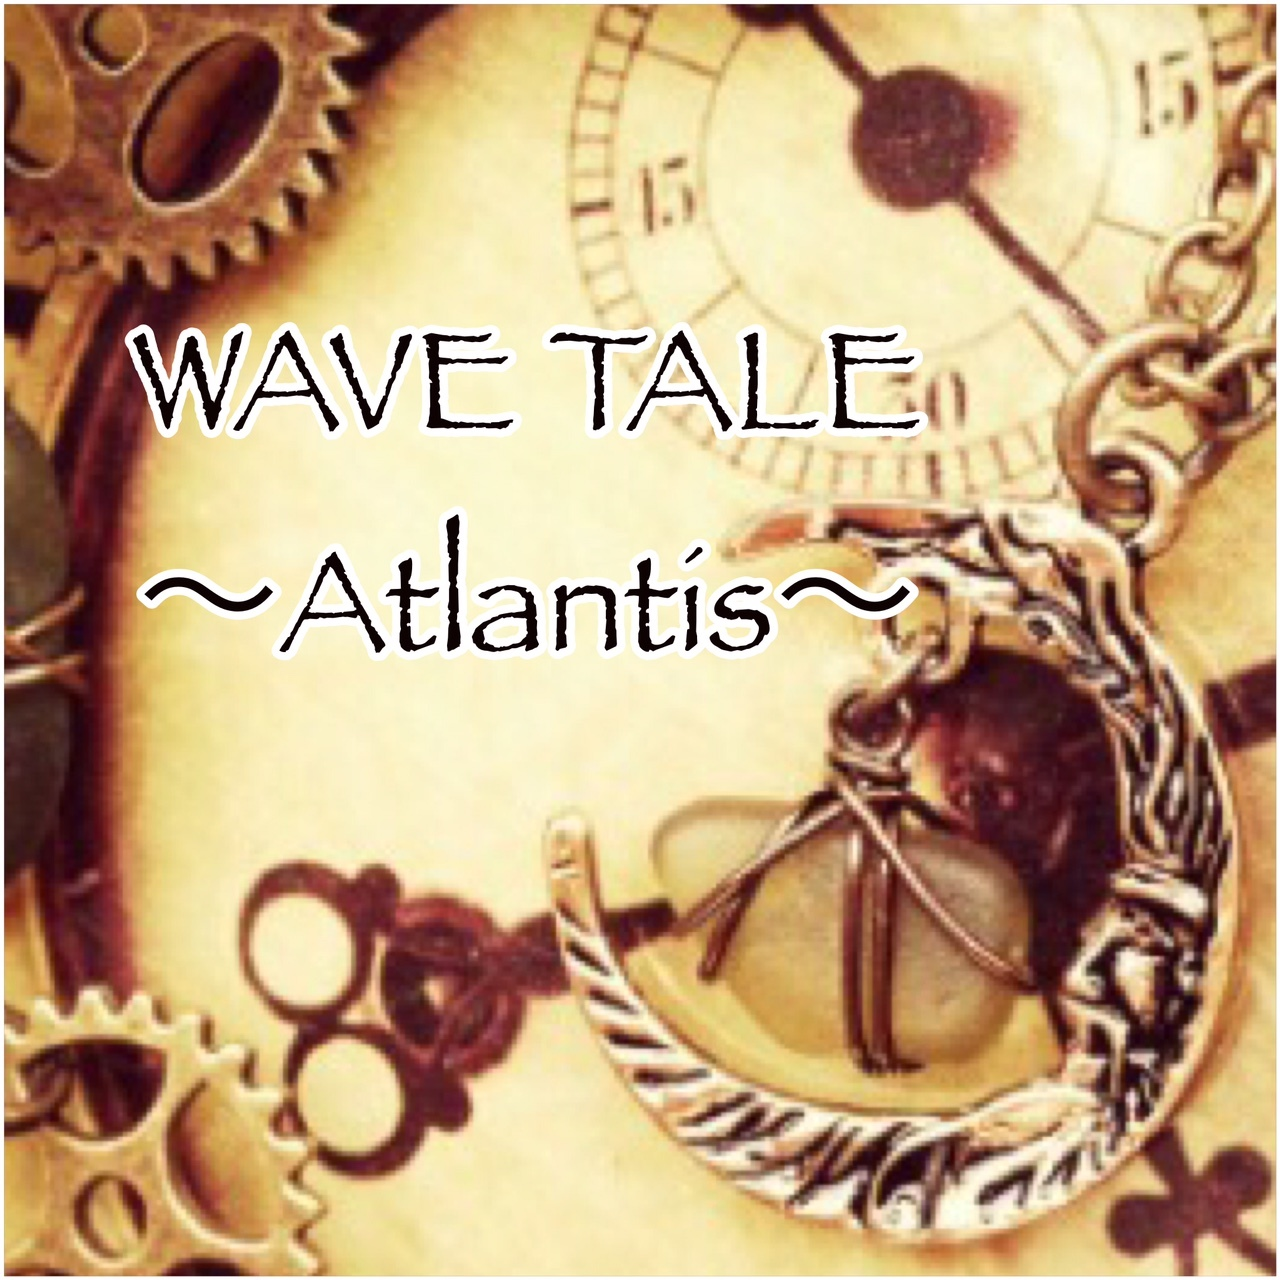 2019_WAVE TALE ~Atlantis~_1